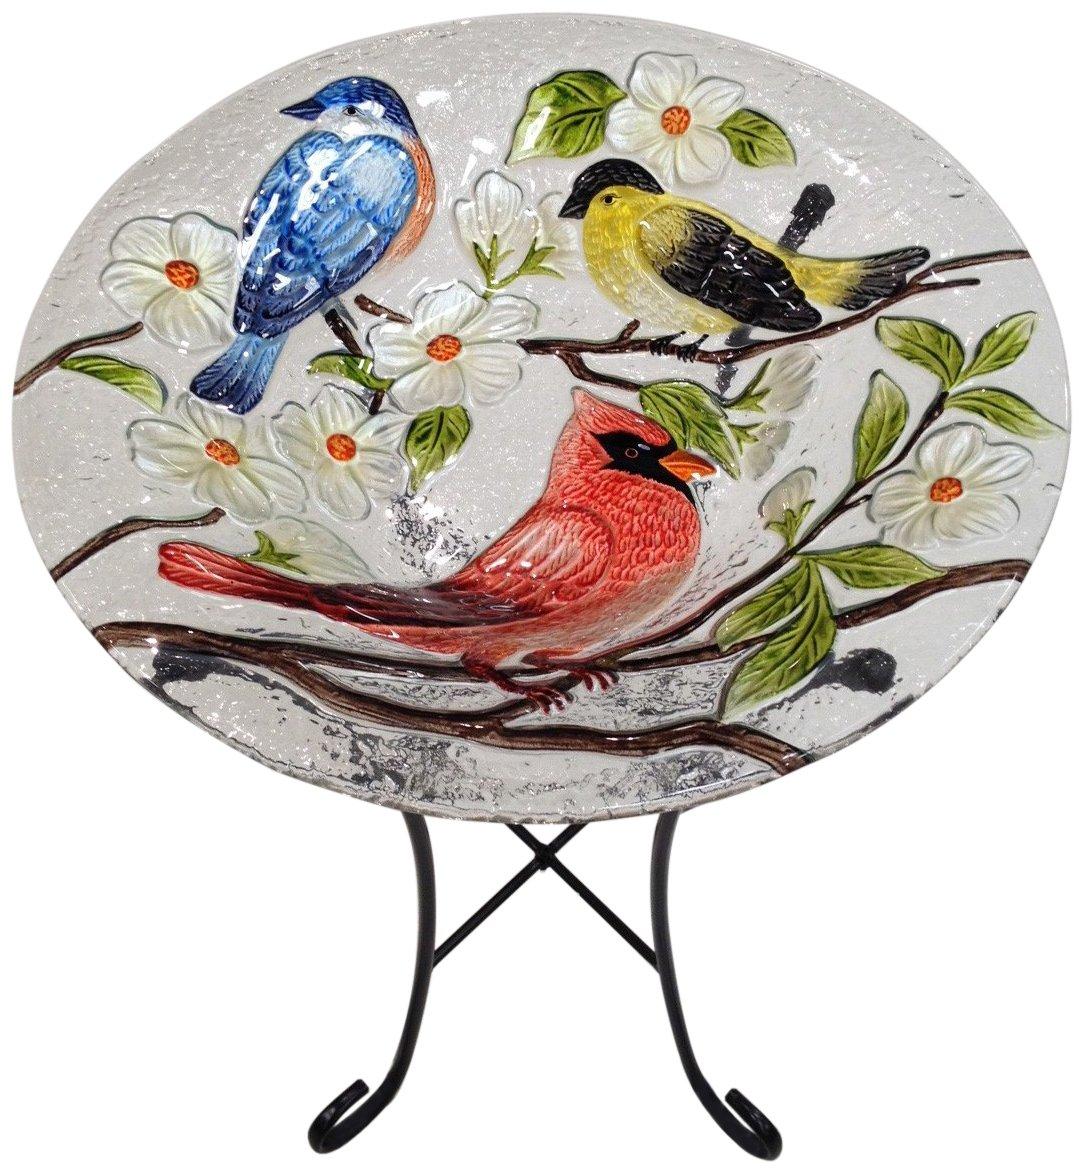 Continental Art Center CAC2412801 Bird Bath Glass Bowl, 13 by 2-Inch, Three Birds